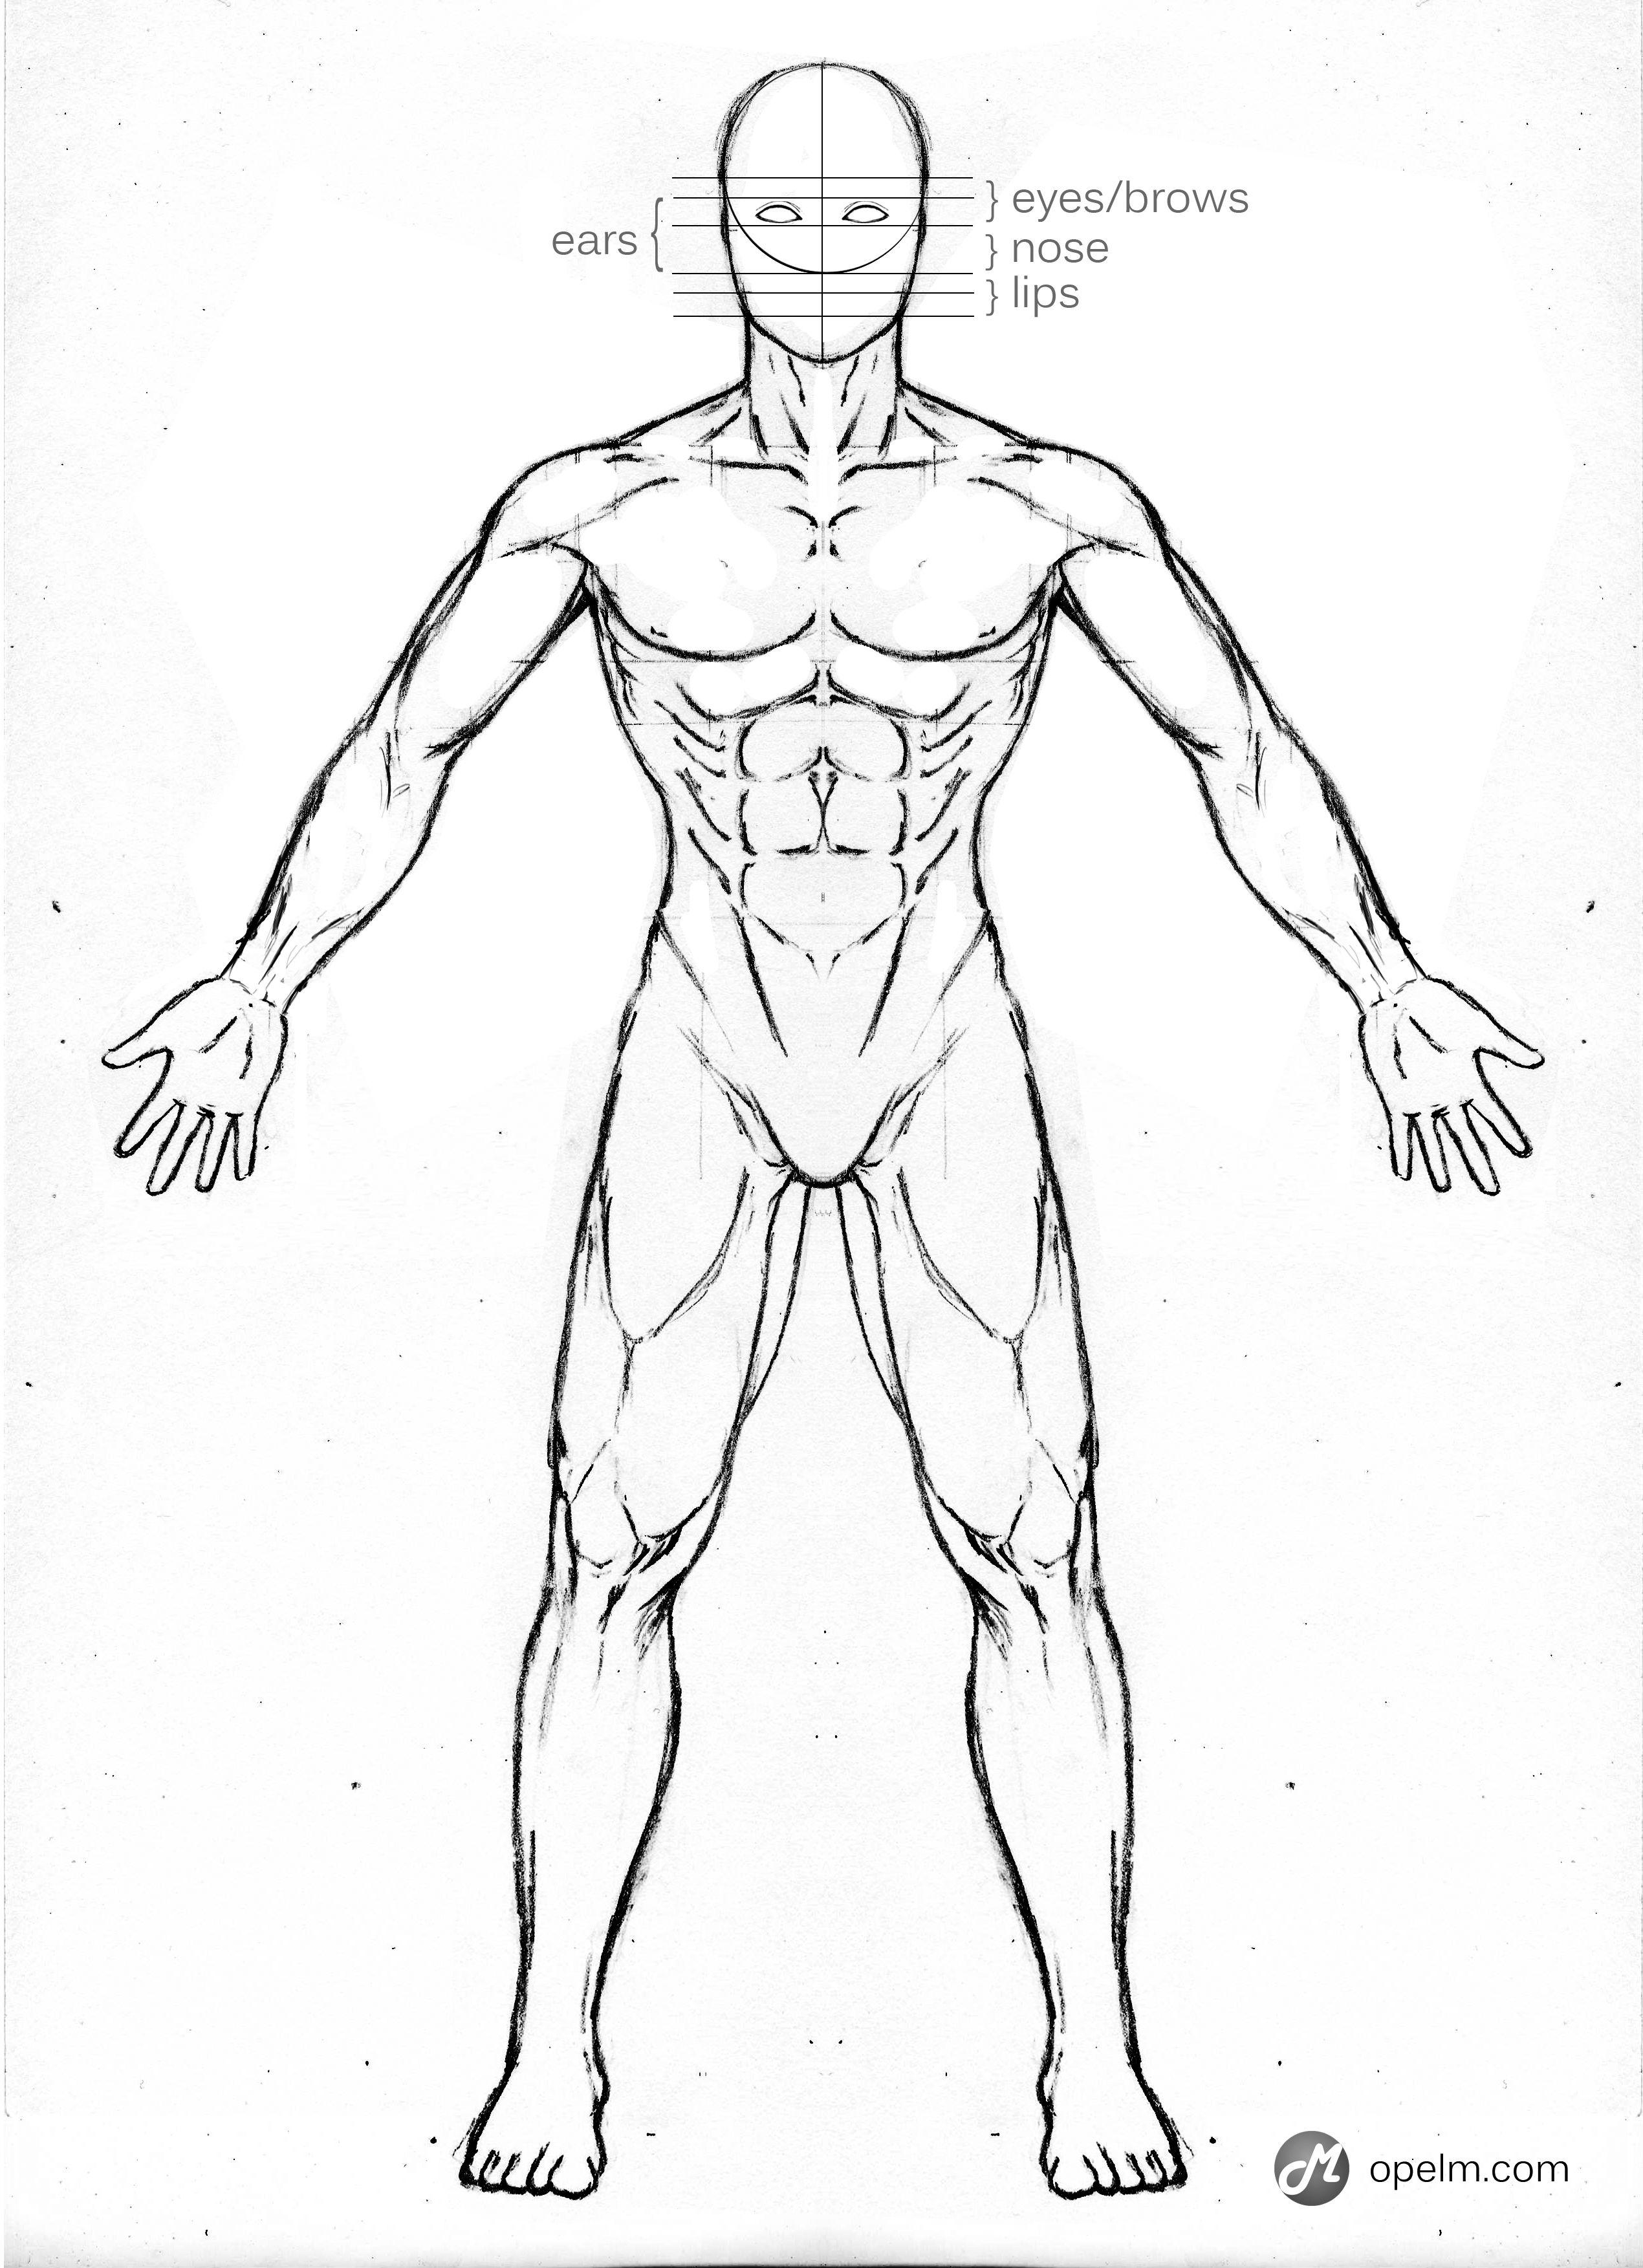 Drawn Anatomy Diagram